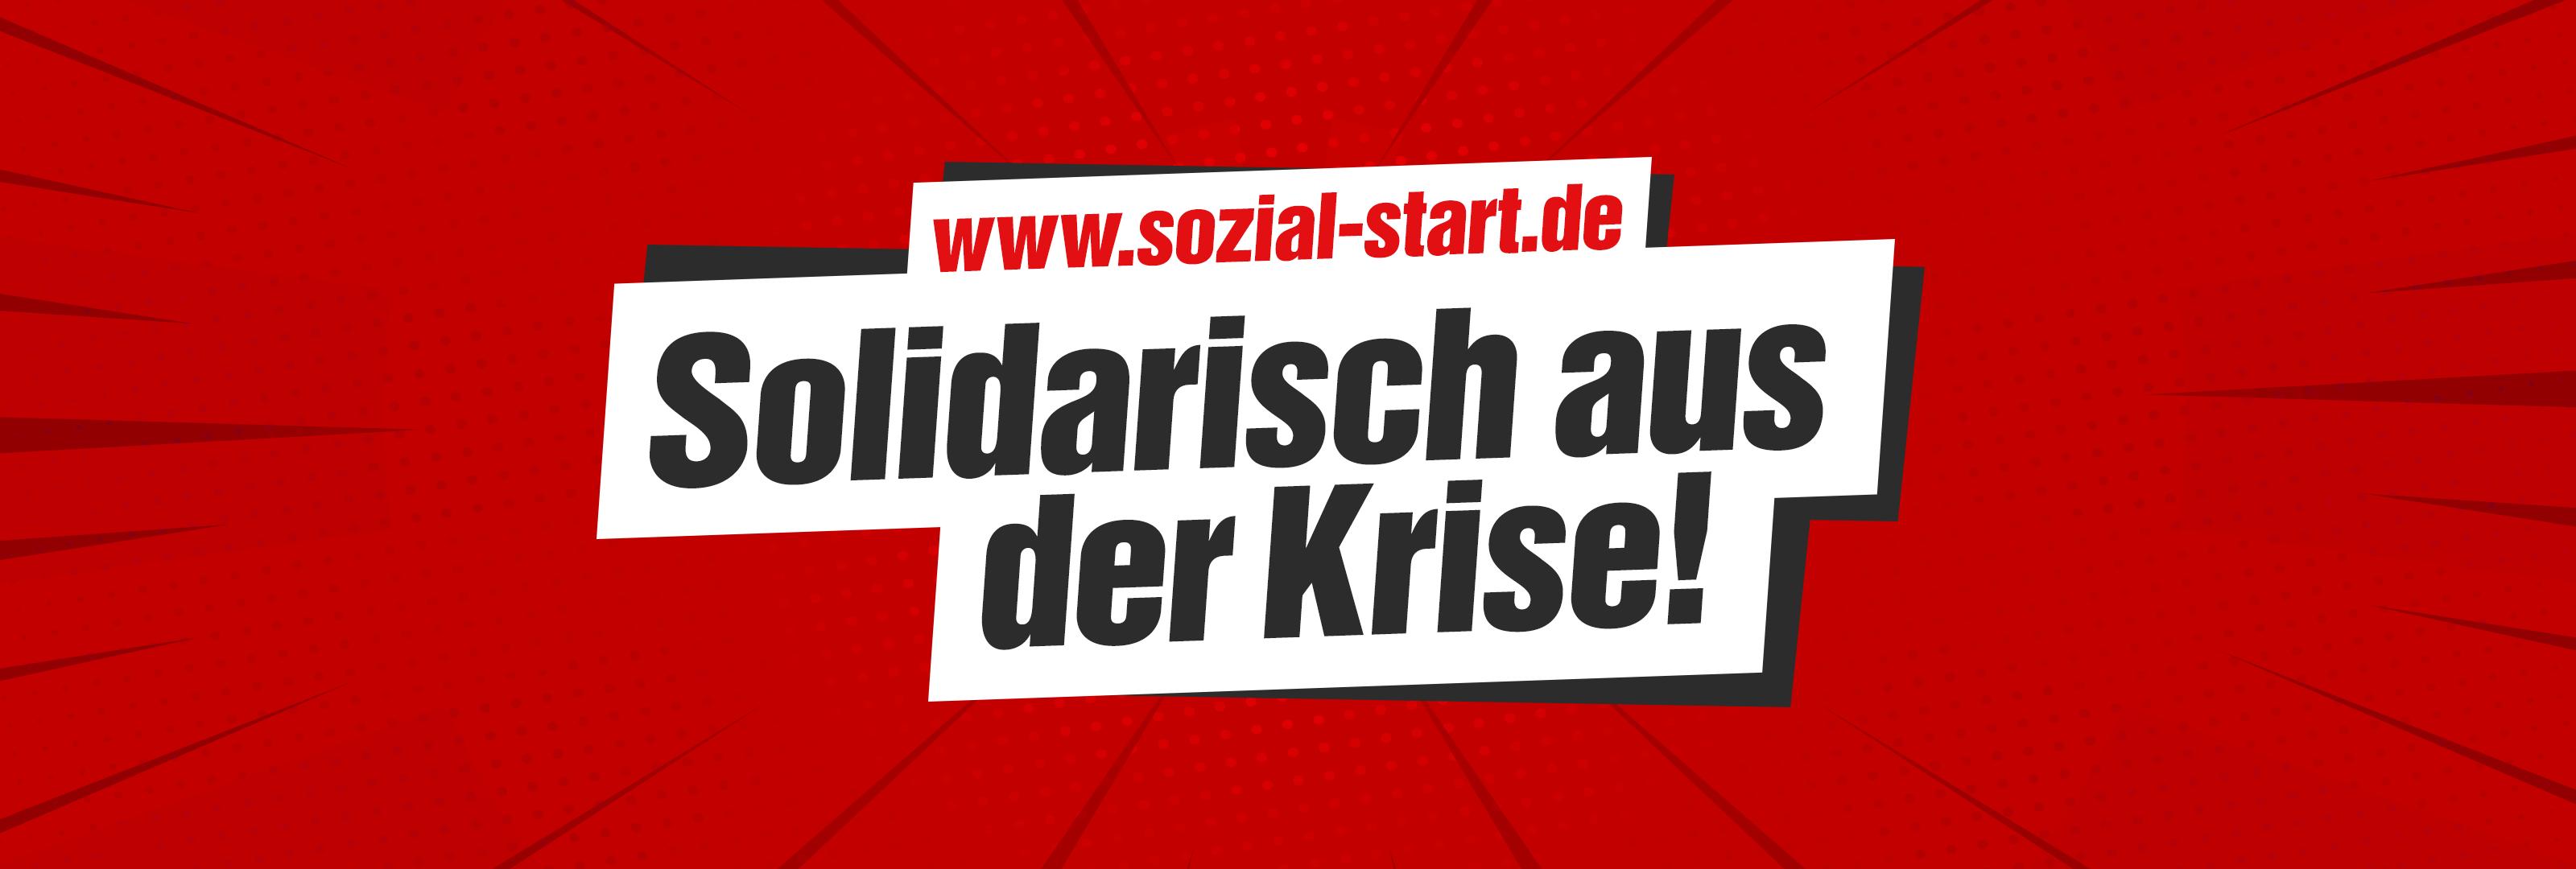 Sozialstart Brandenburg